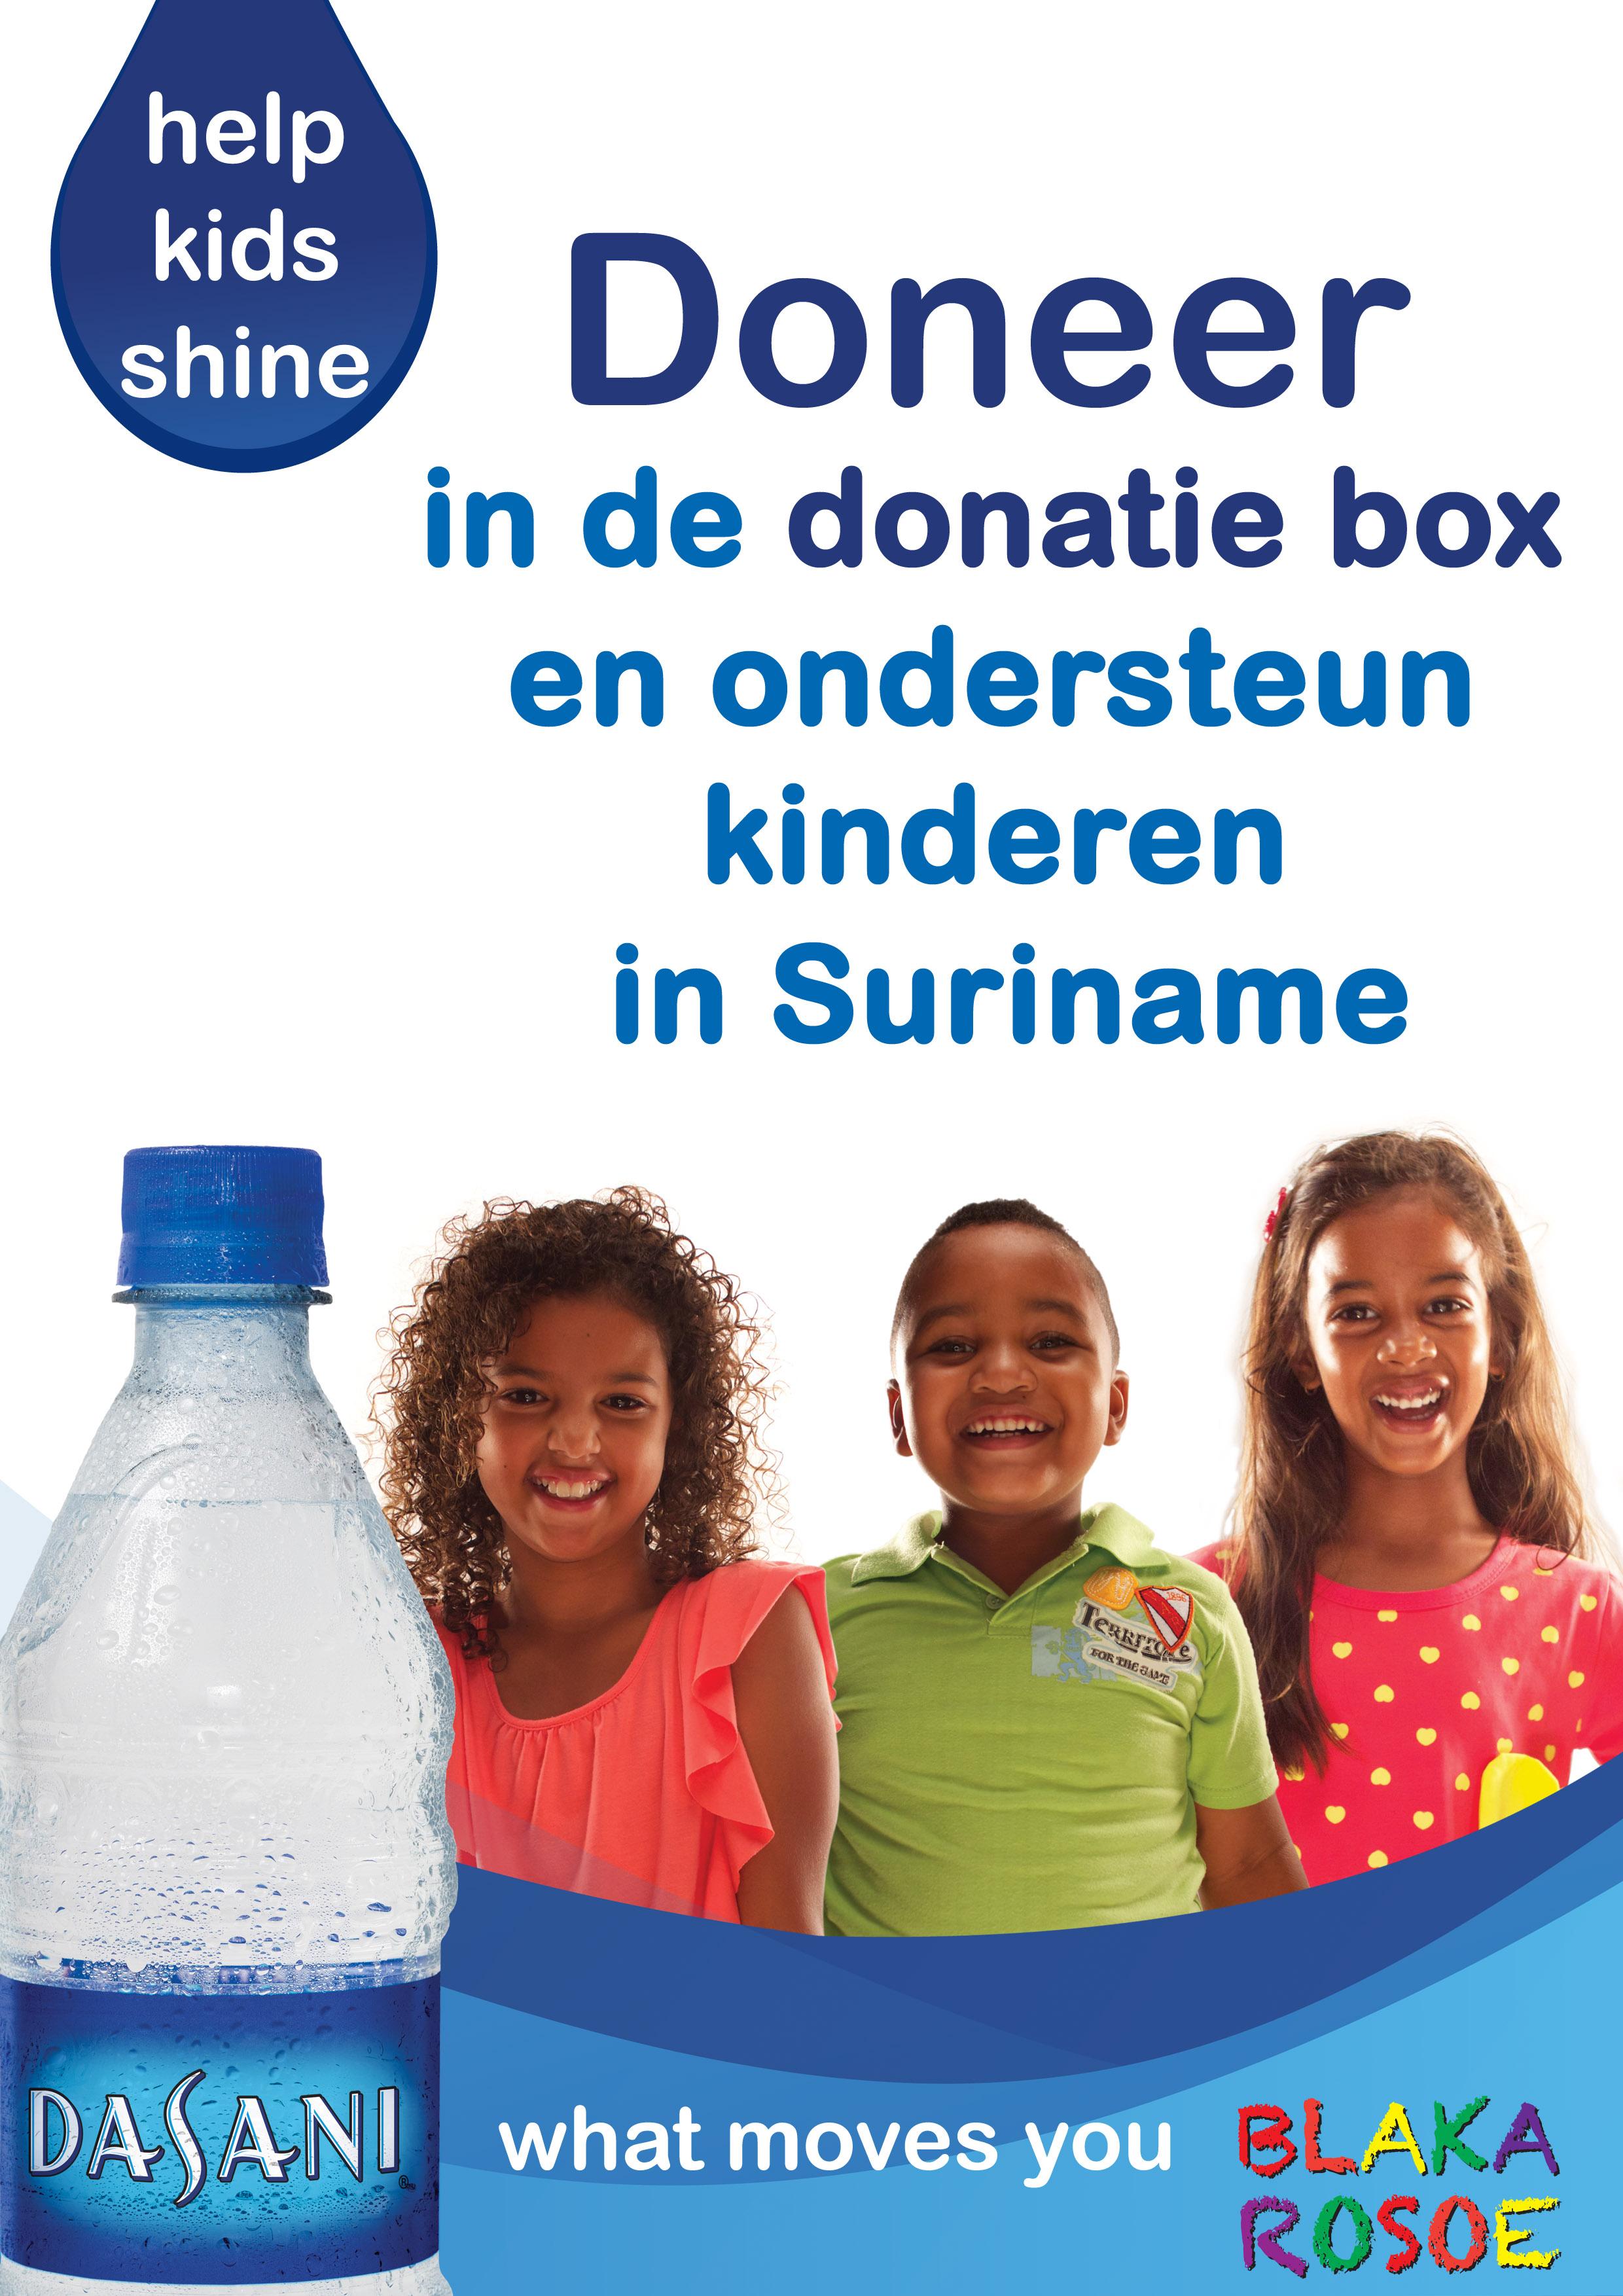 Dasani Help Kids Shine donatie